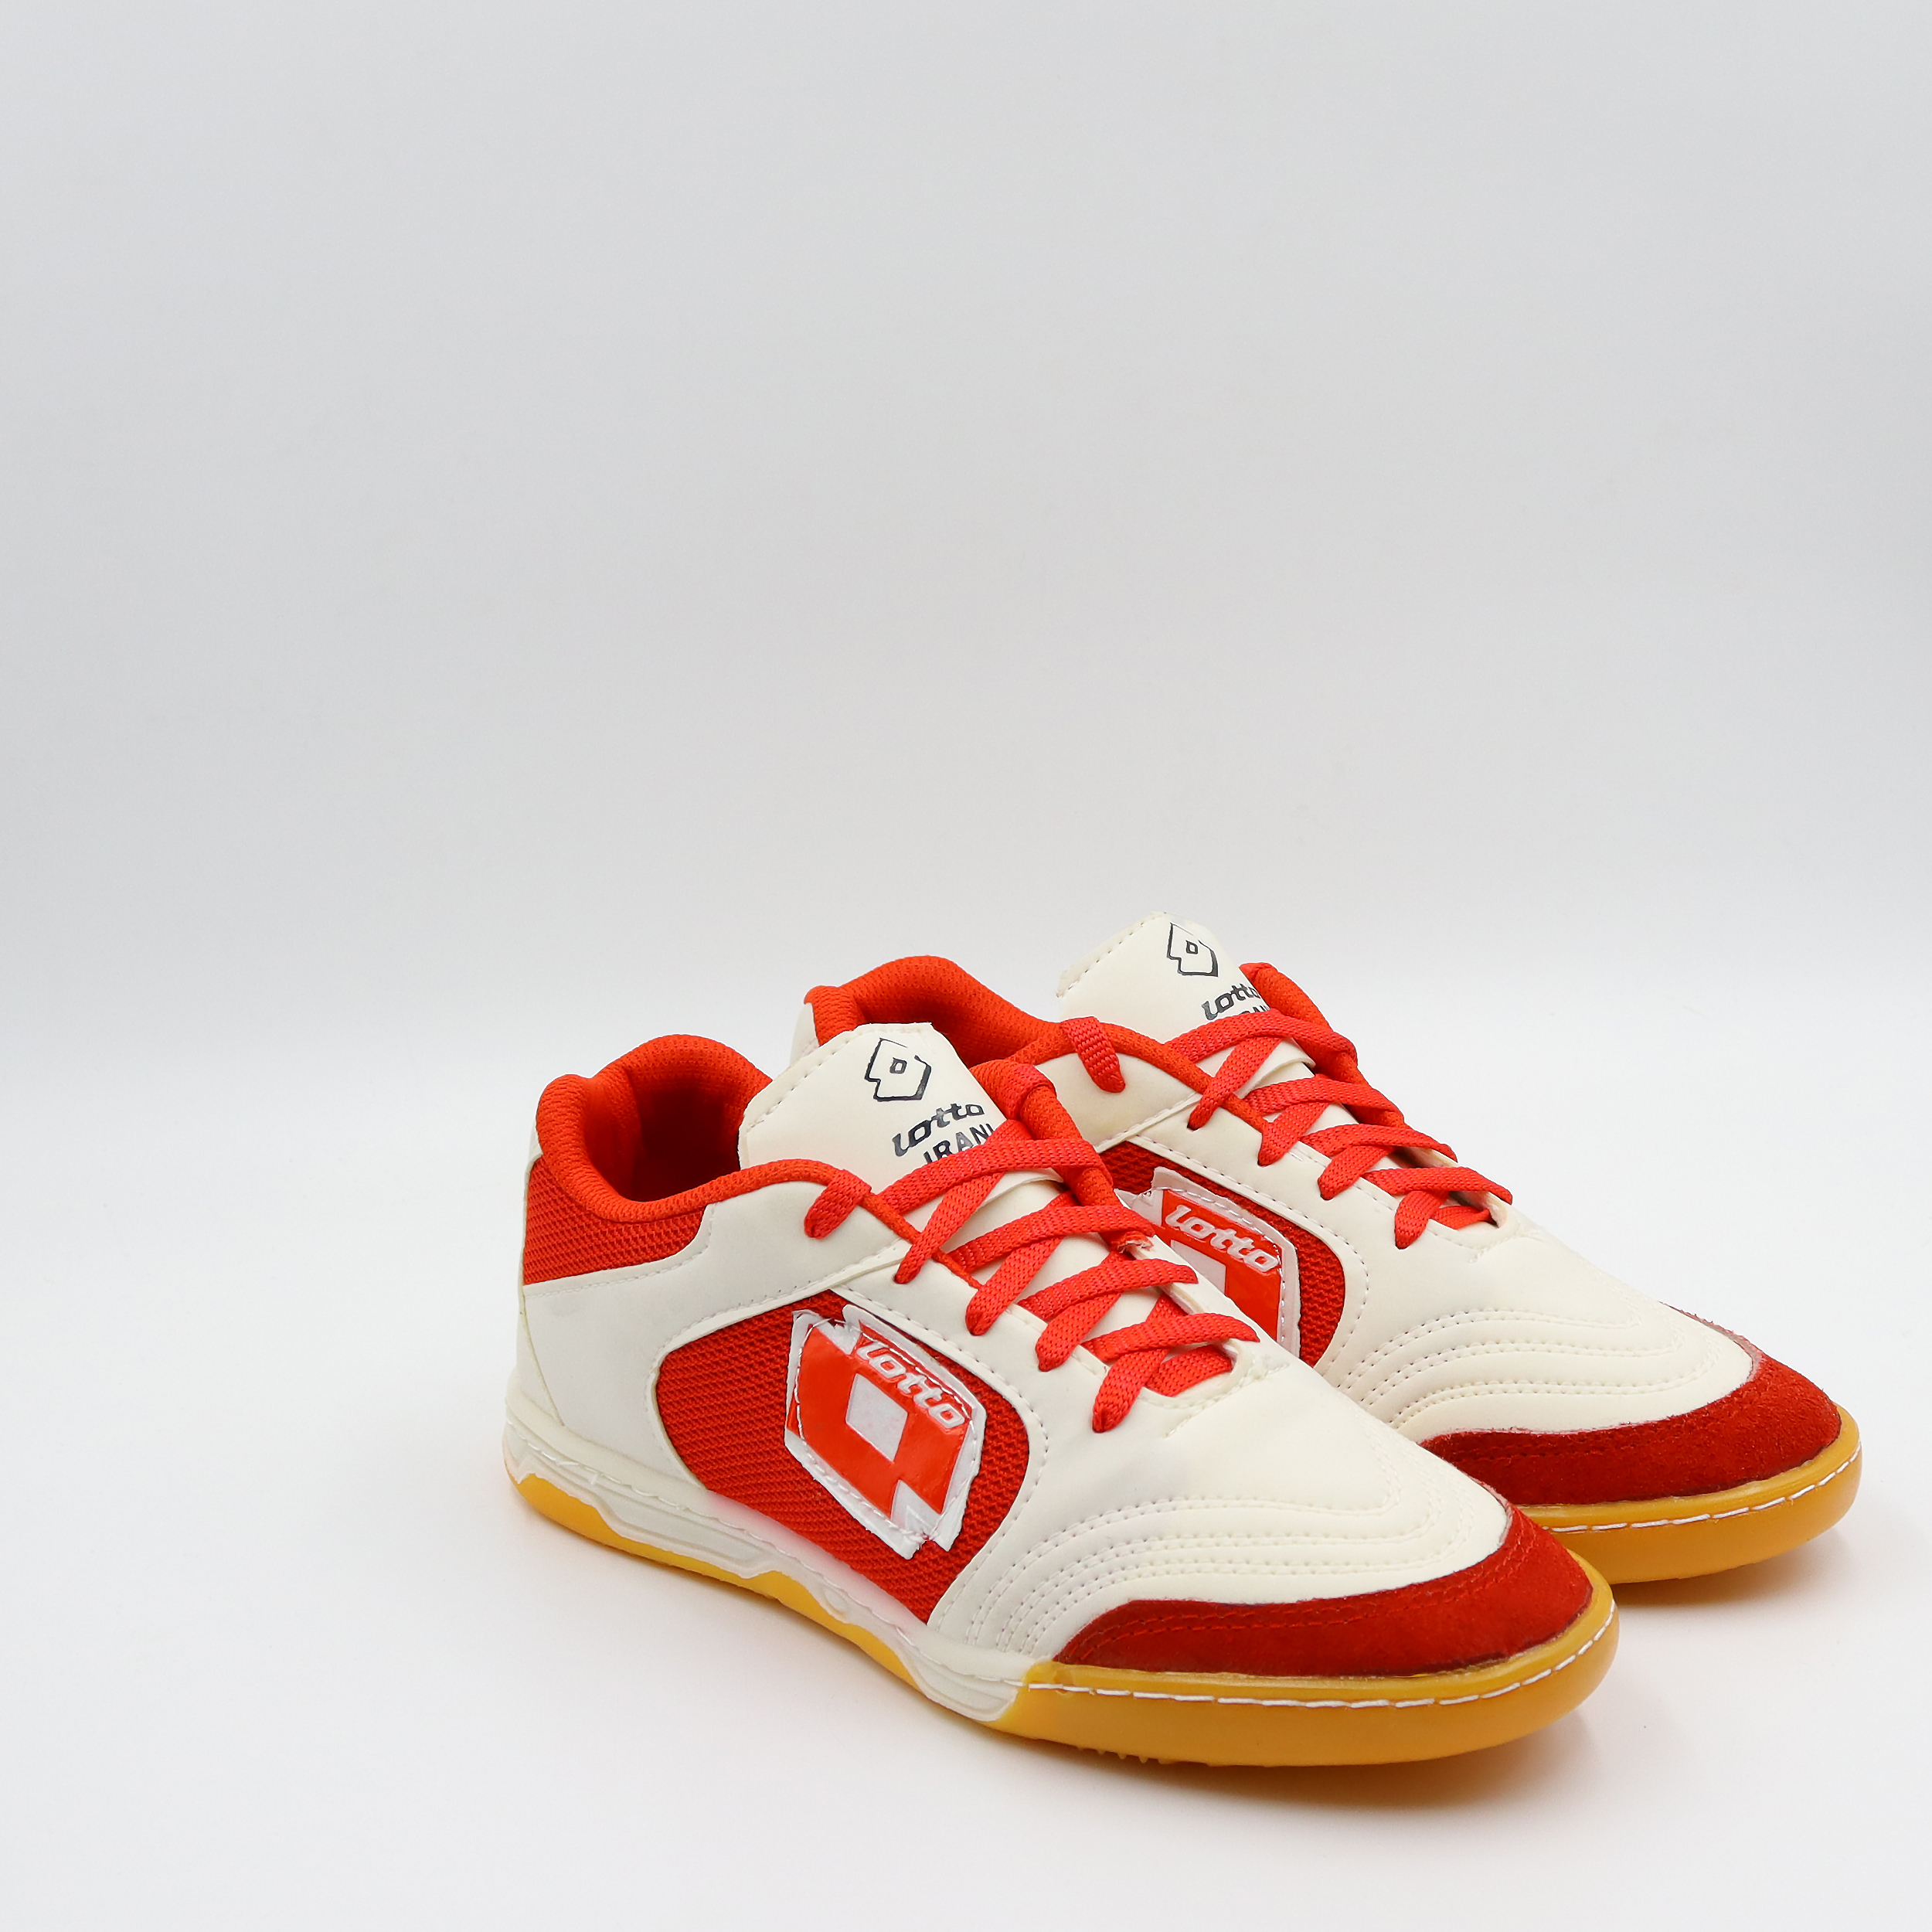 خرید                      کفش فوتبال مردانه کد 648